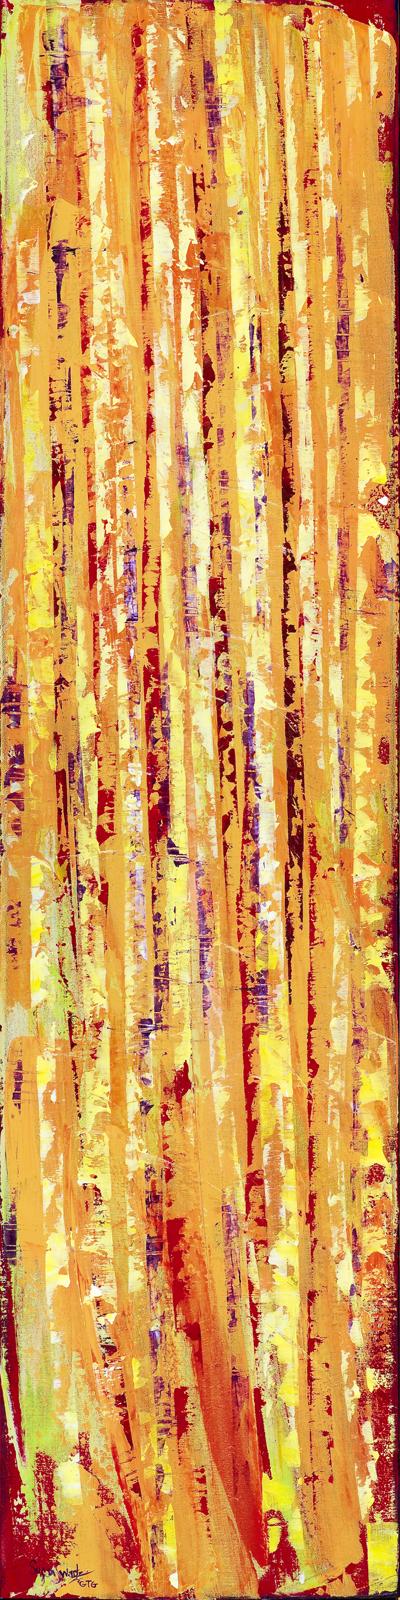 Untitled 018 12 x 48